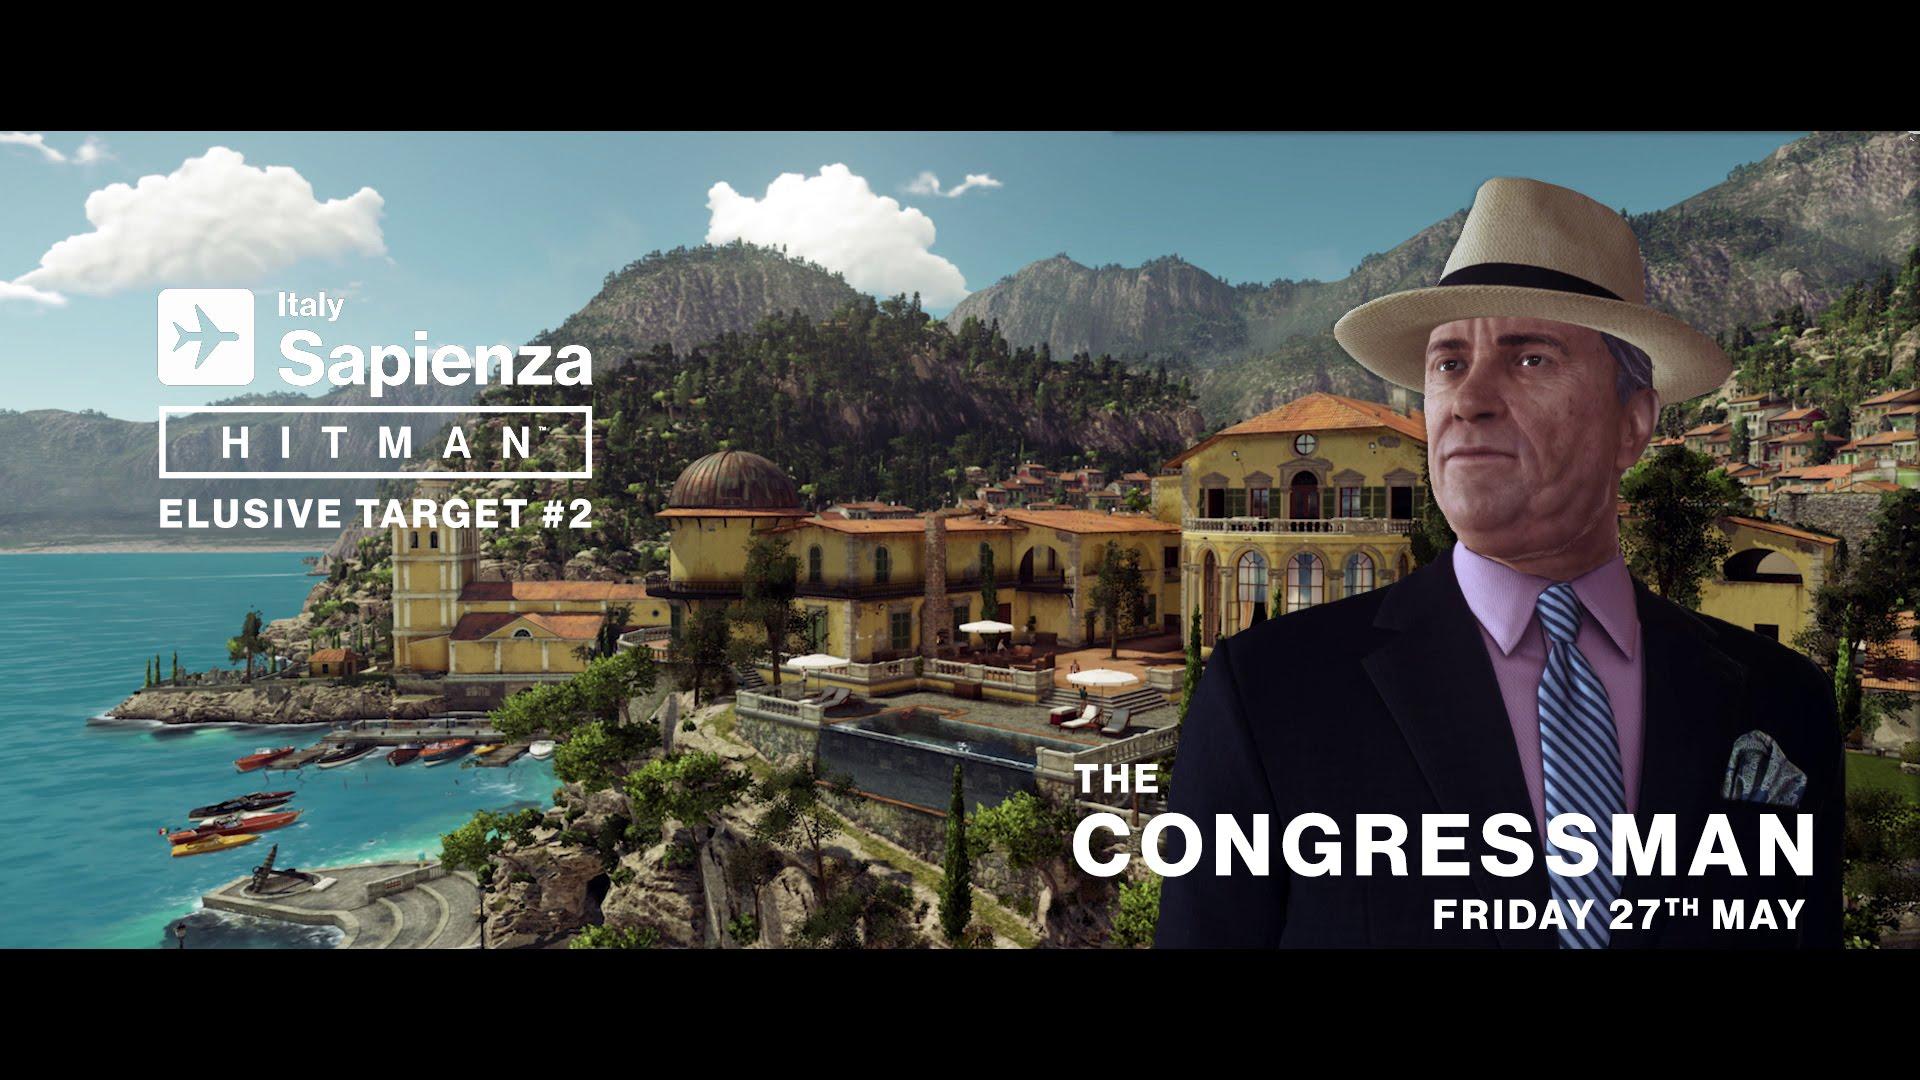 HITMAN - Elusive Target #2 - The Congressman